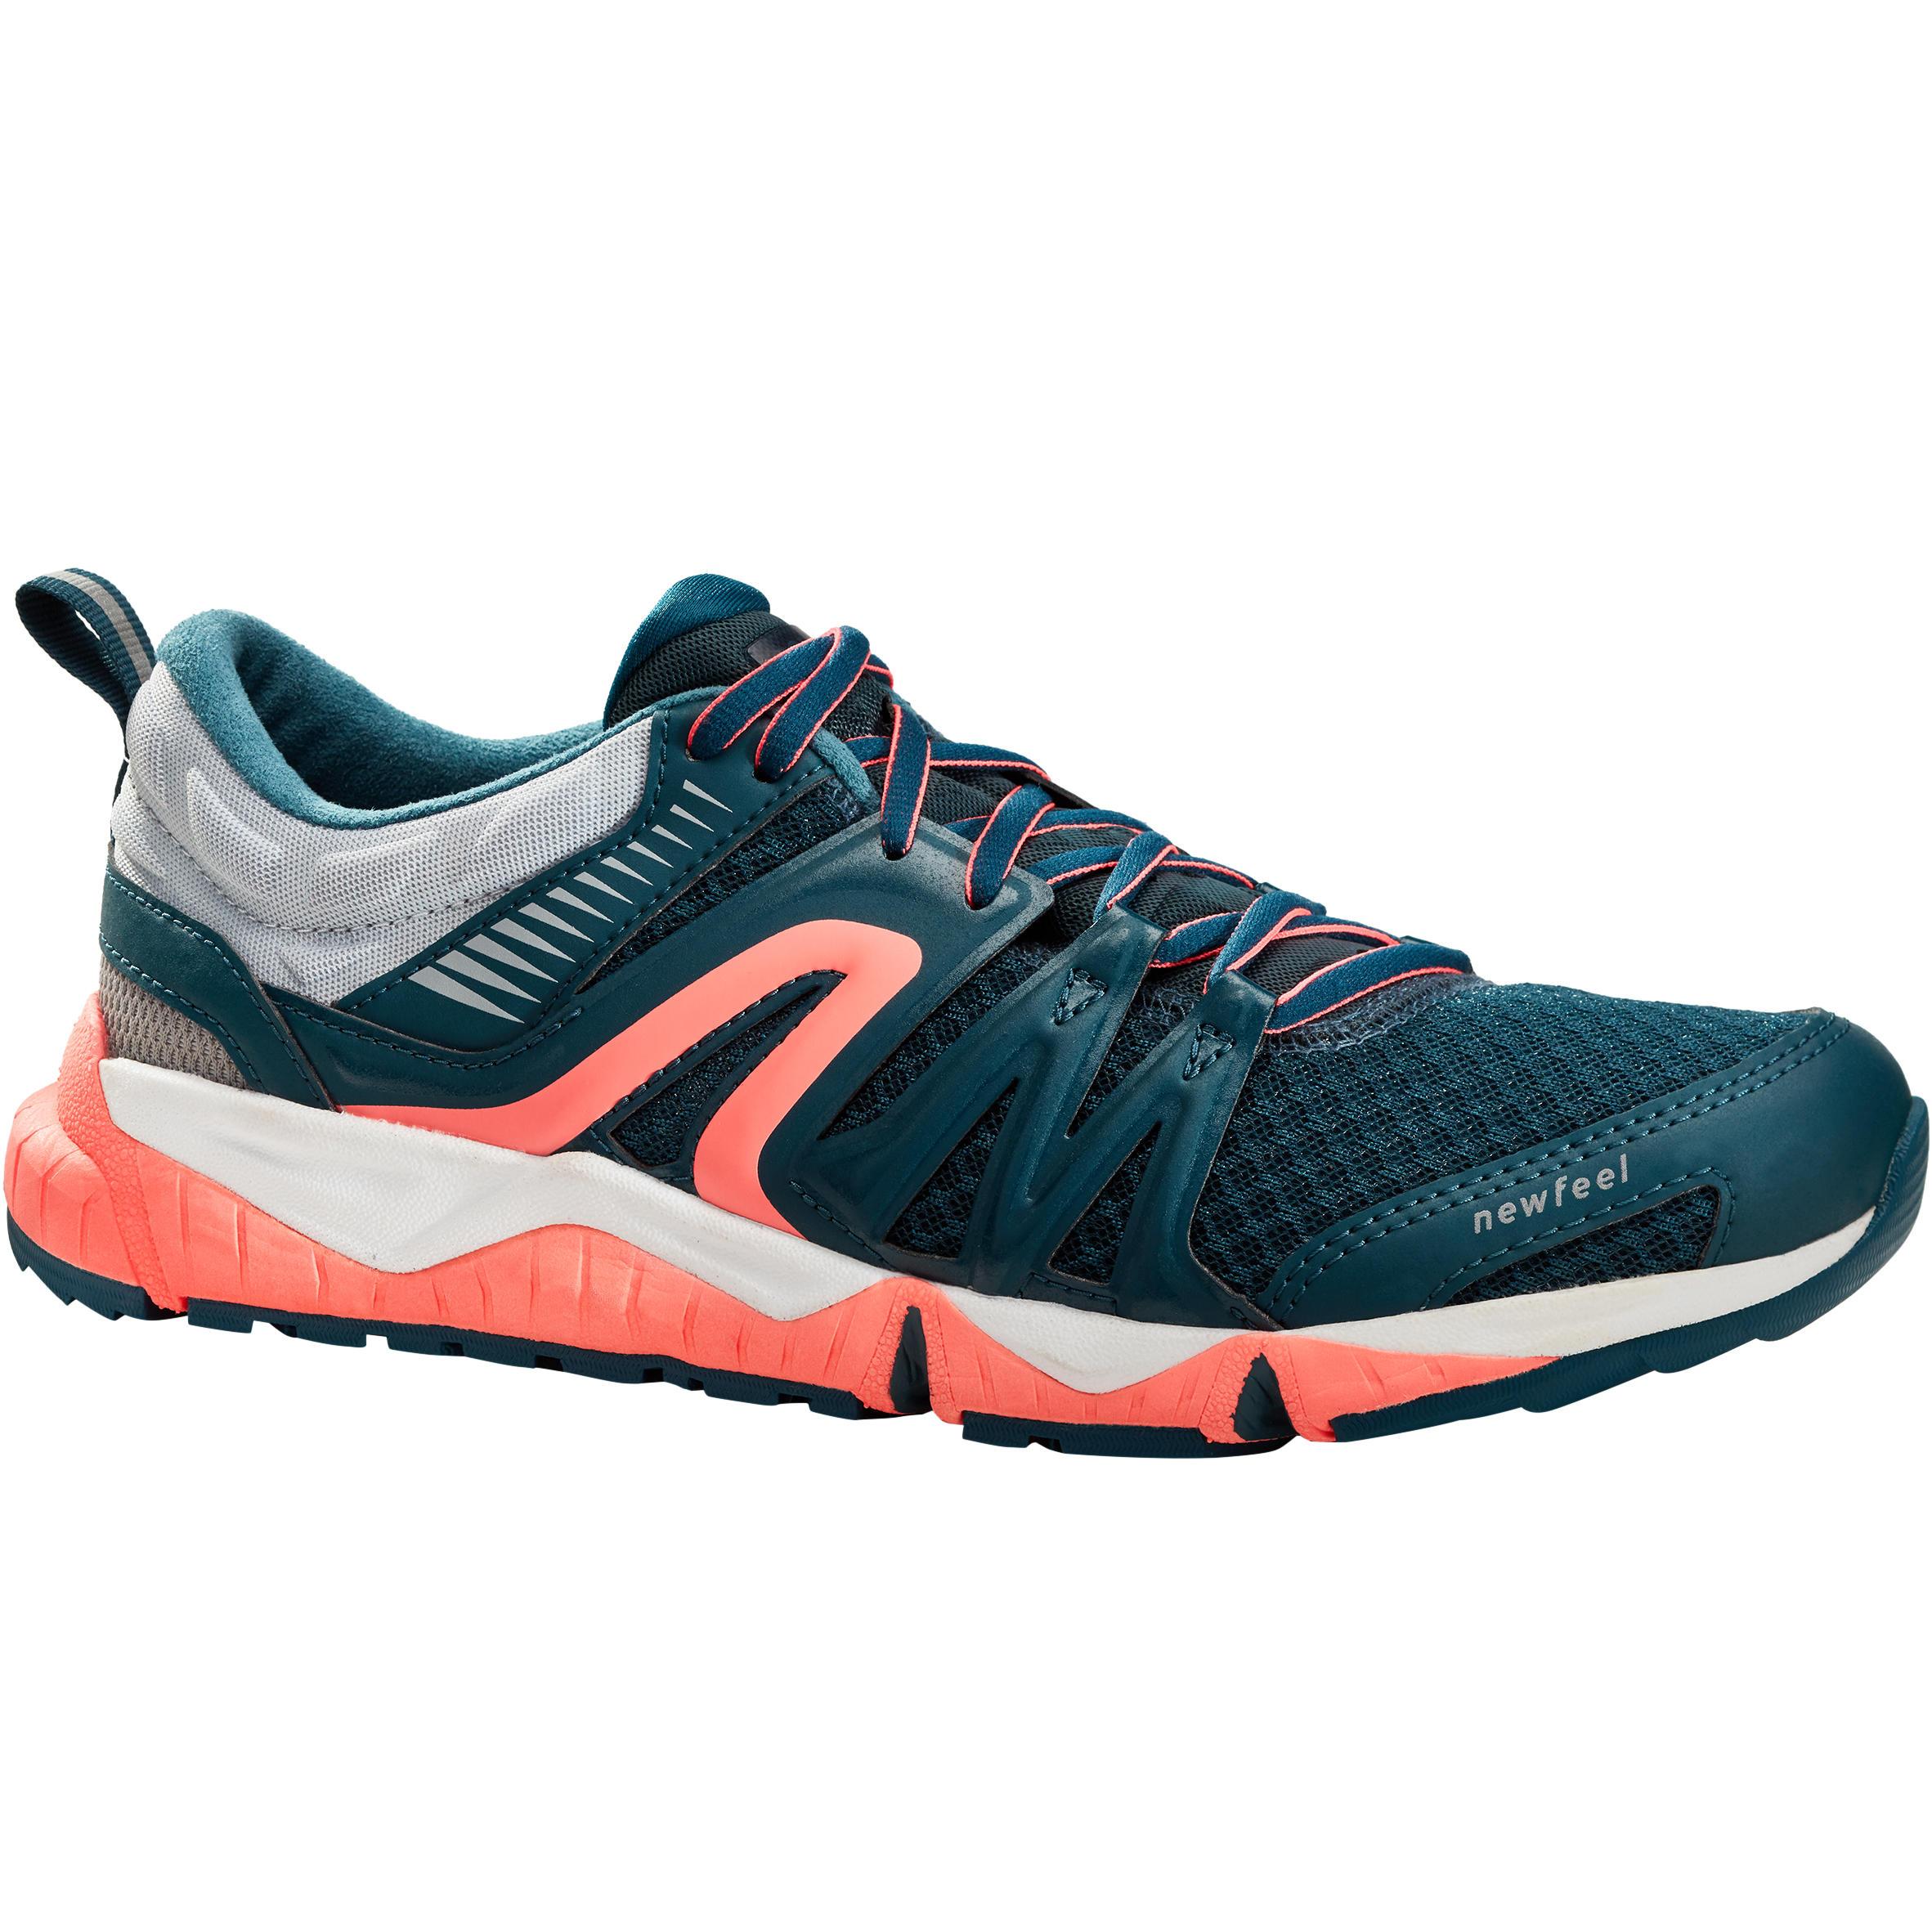 Newfeel Chaussures marche sportive femme PW 900 Propulse Motion bleu grisé - Newfeel